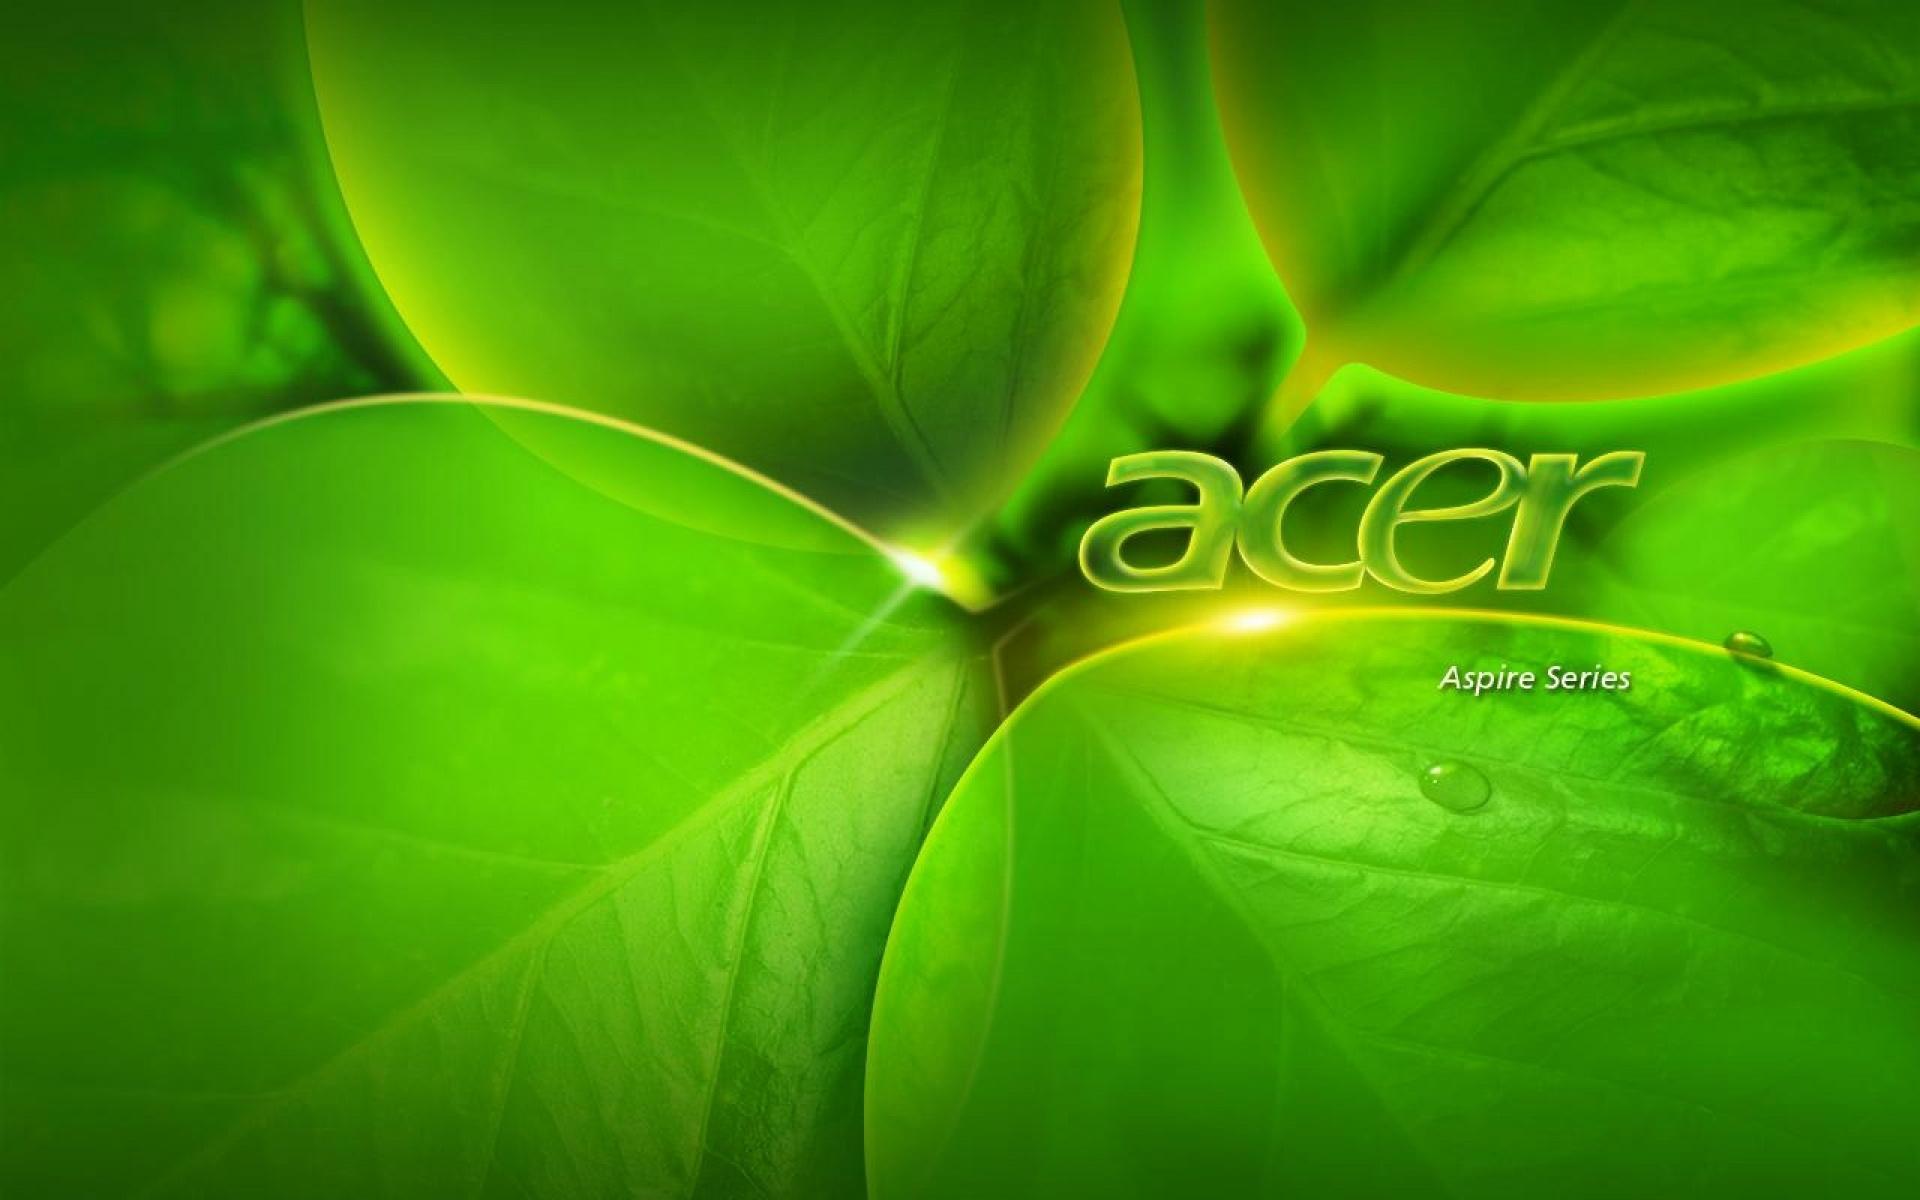 Download Acer Background wallpaperwiki   Wallpaper 1920x1200